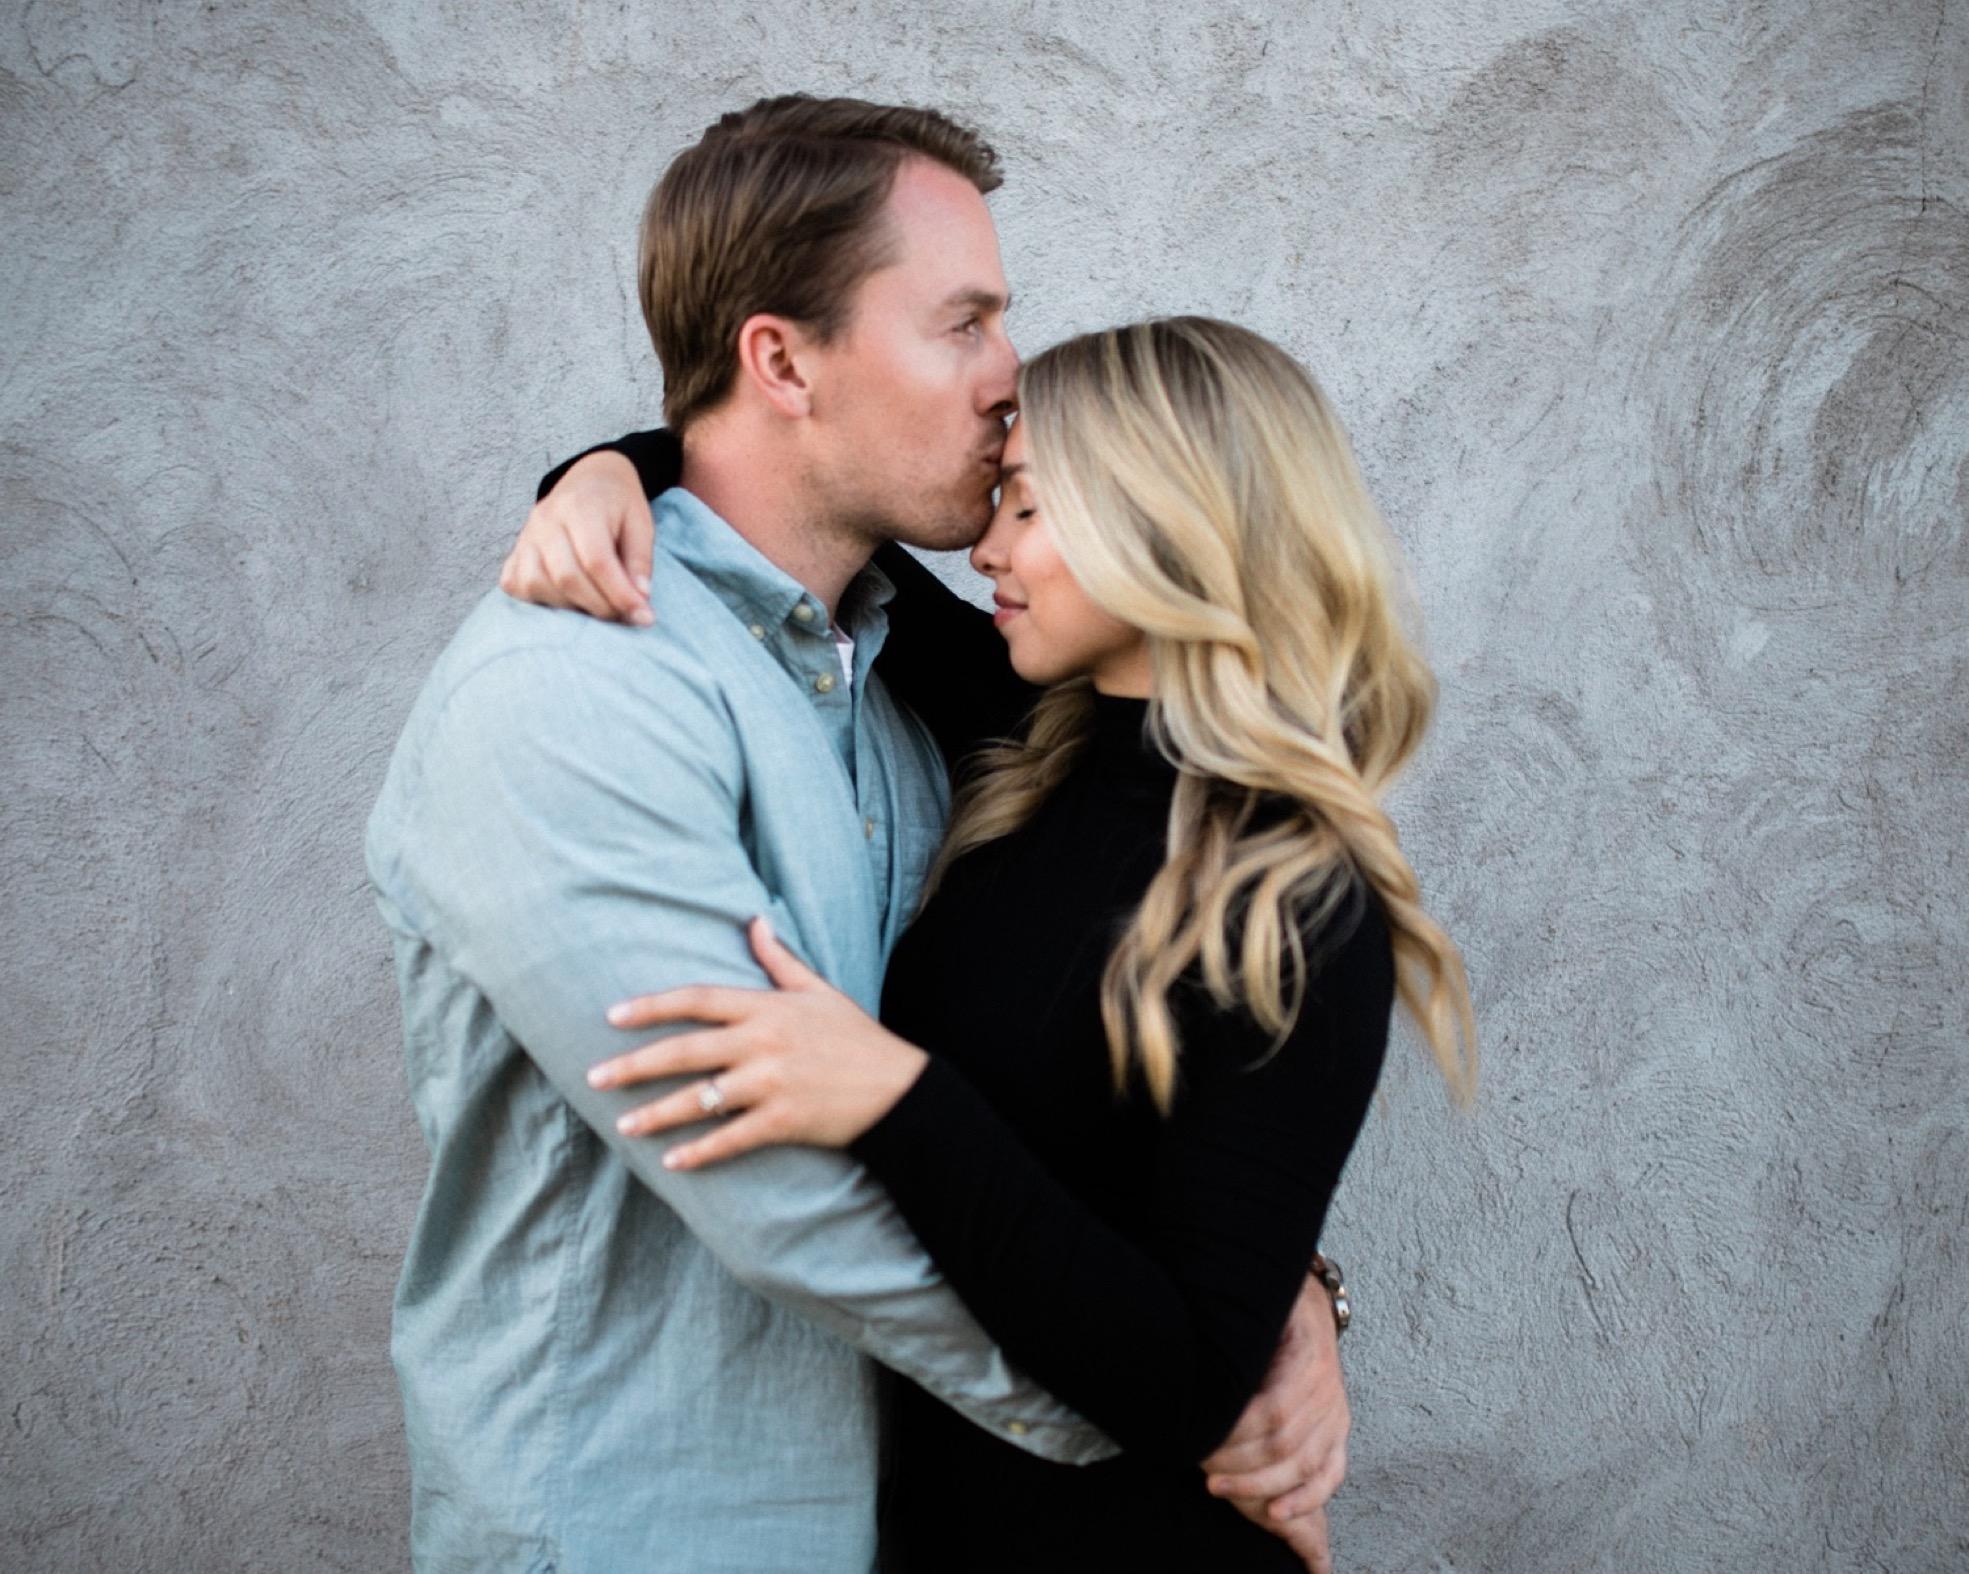 56_Marfa-Texas-Engagement-Jessica-Sherrell-301.jpg